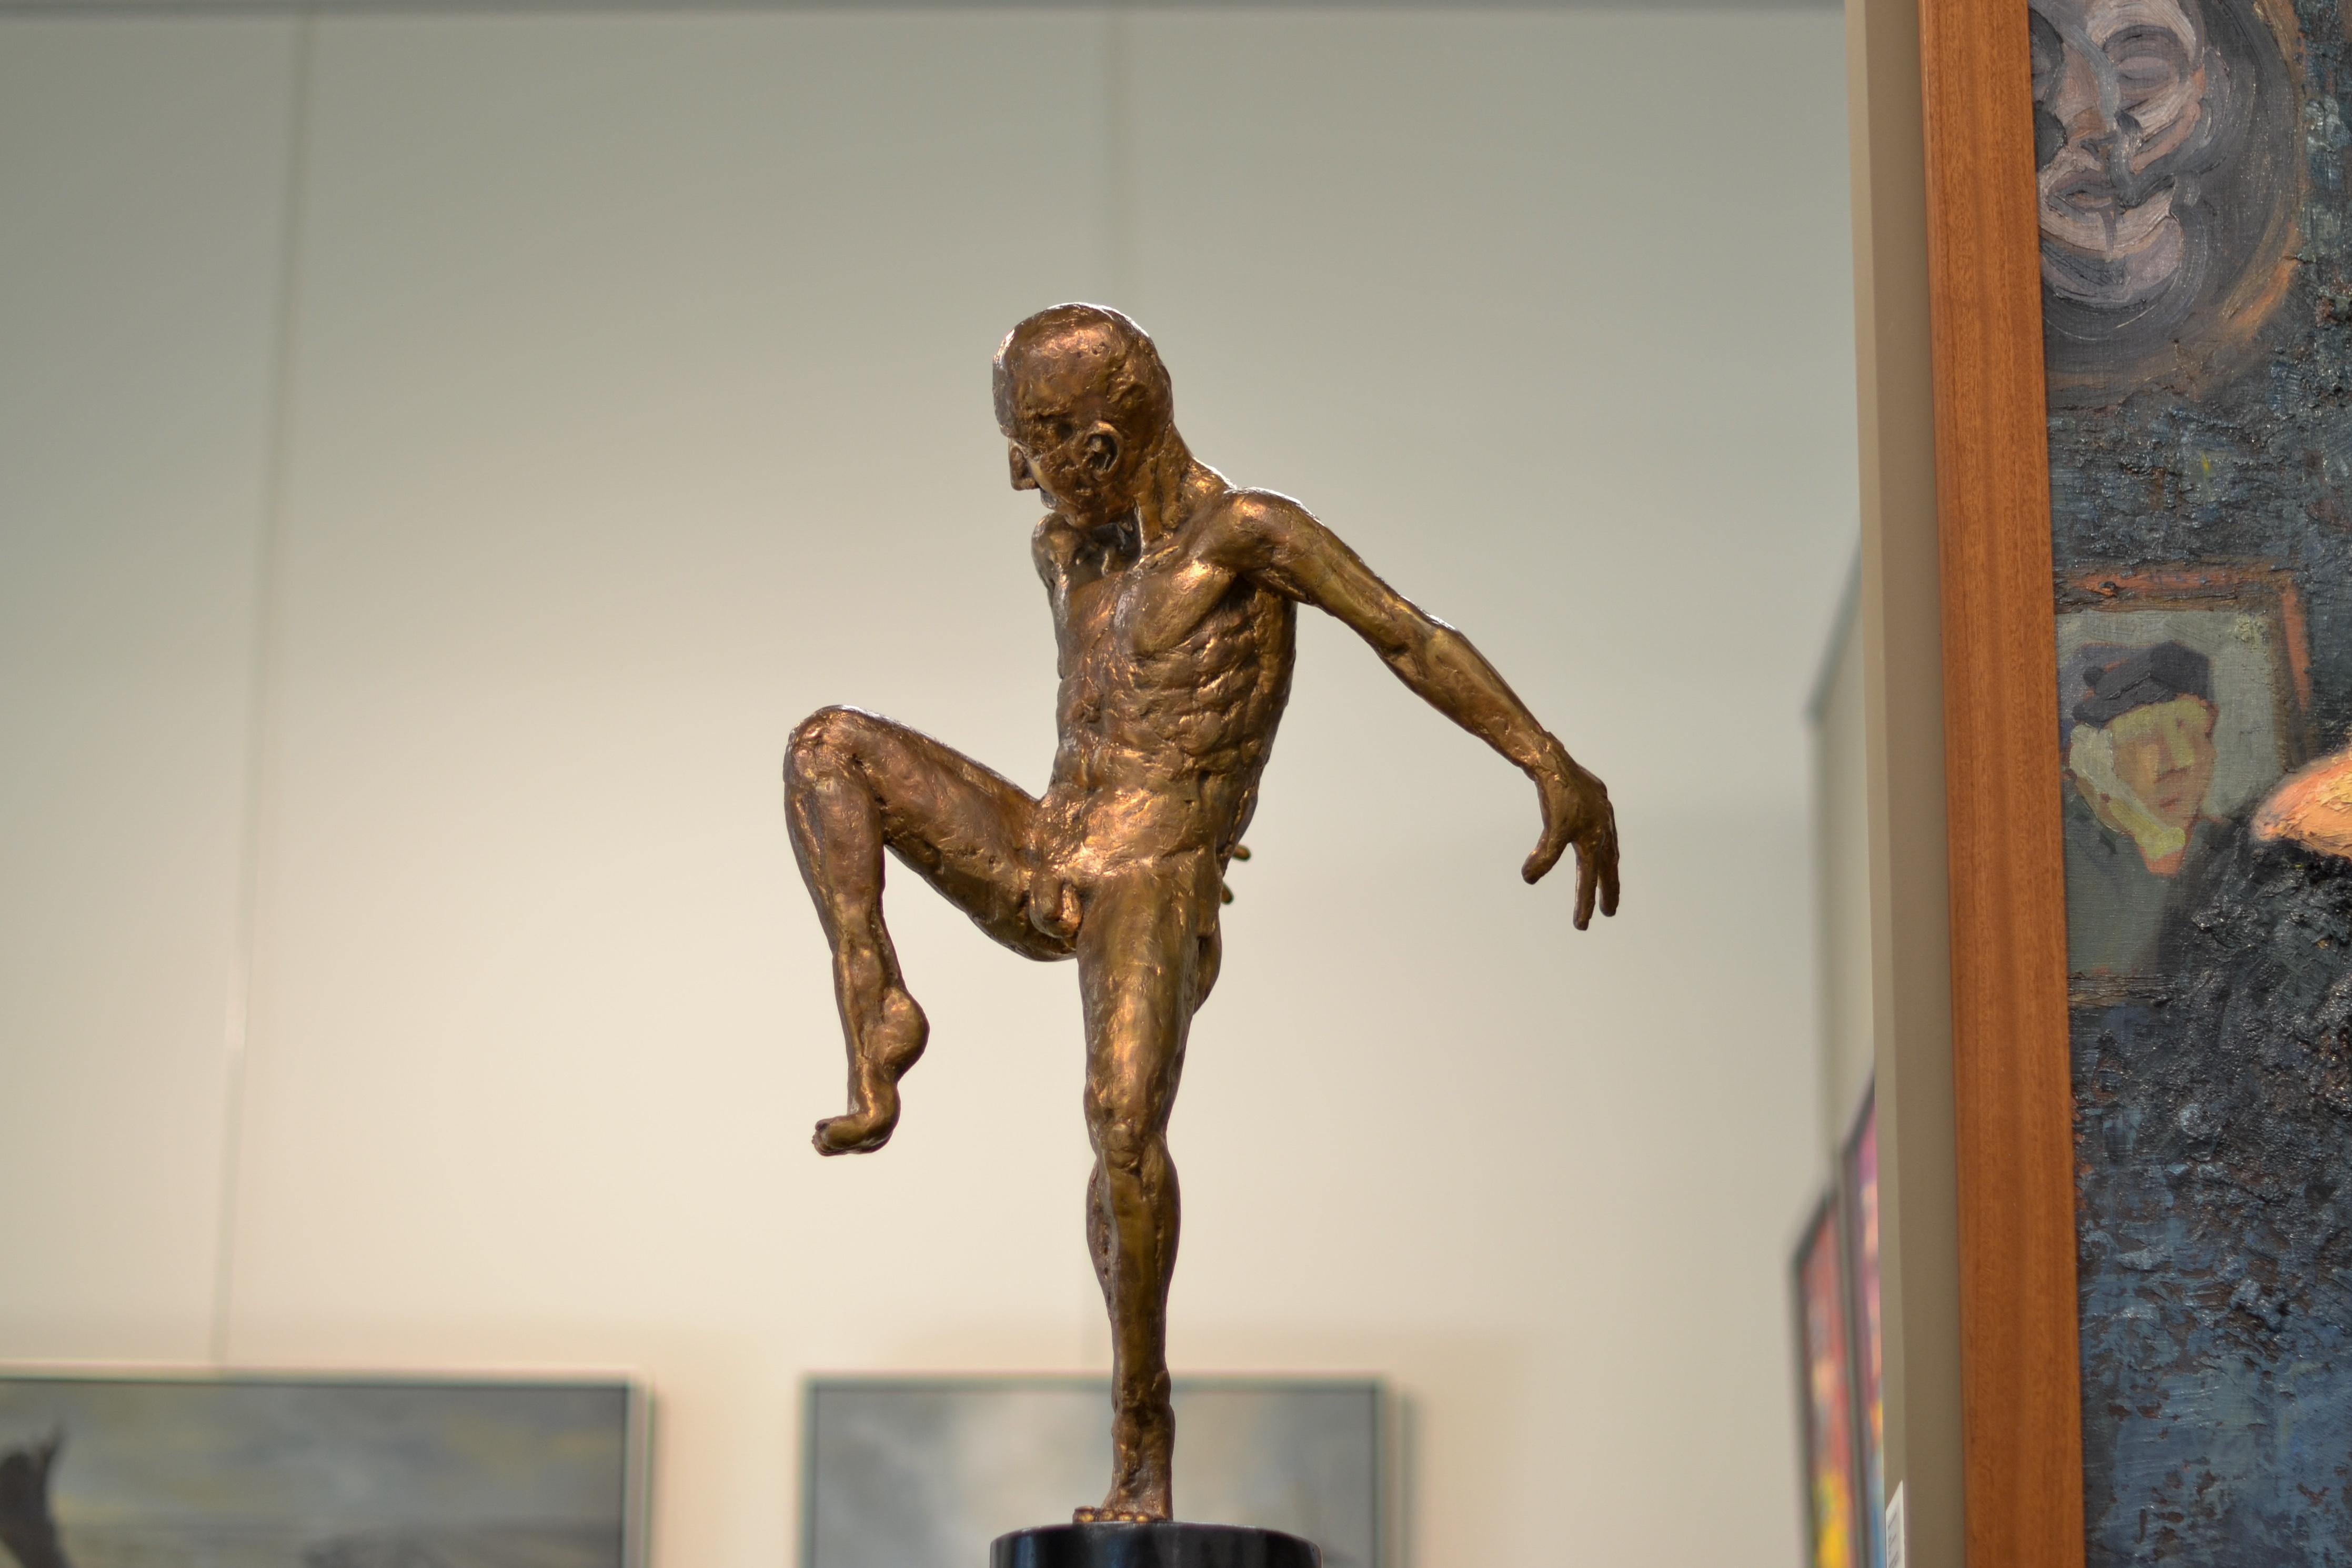 Dancer no. 5 - Martijn Soontiens, 21st Century Contemporary Sculpture of a Man